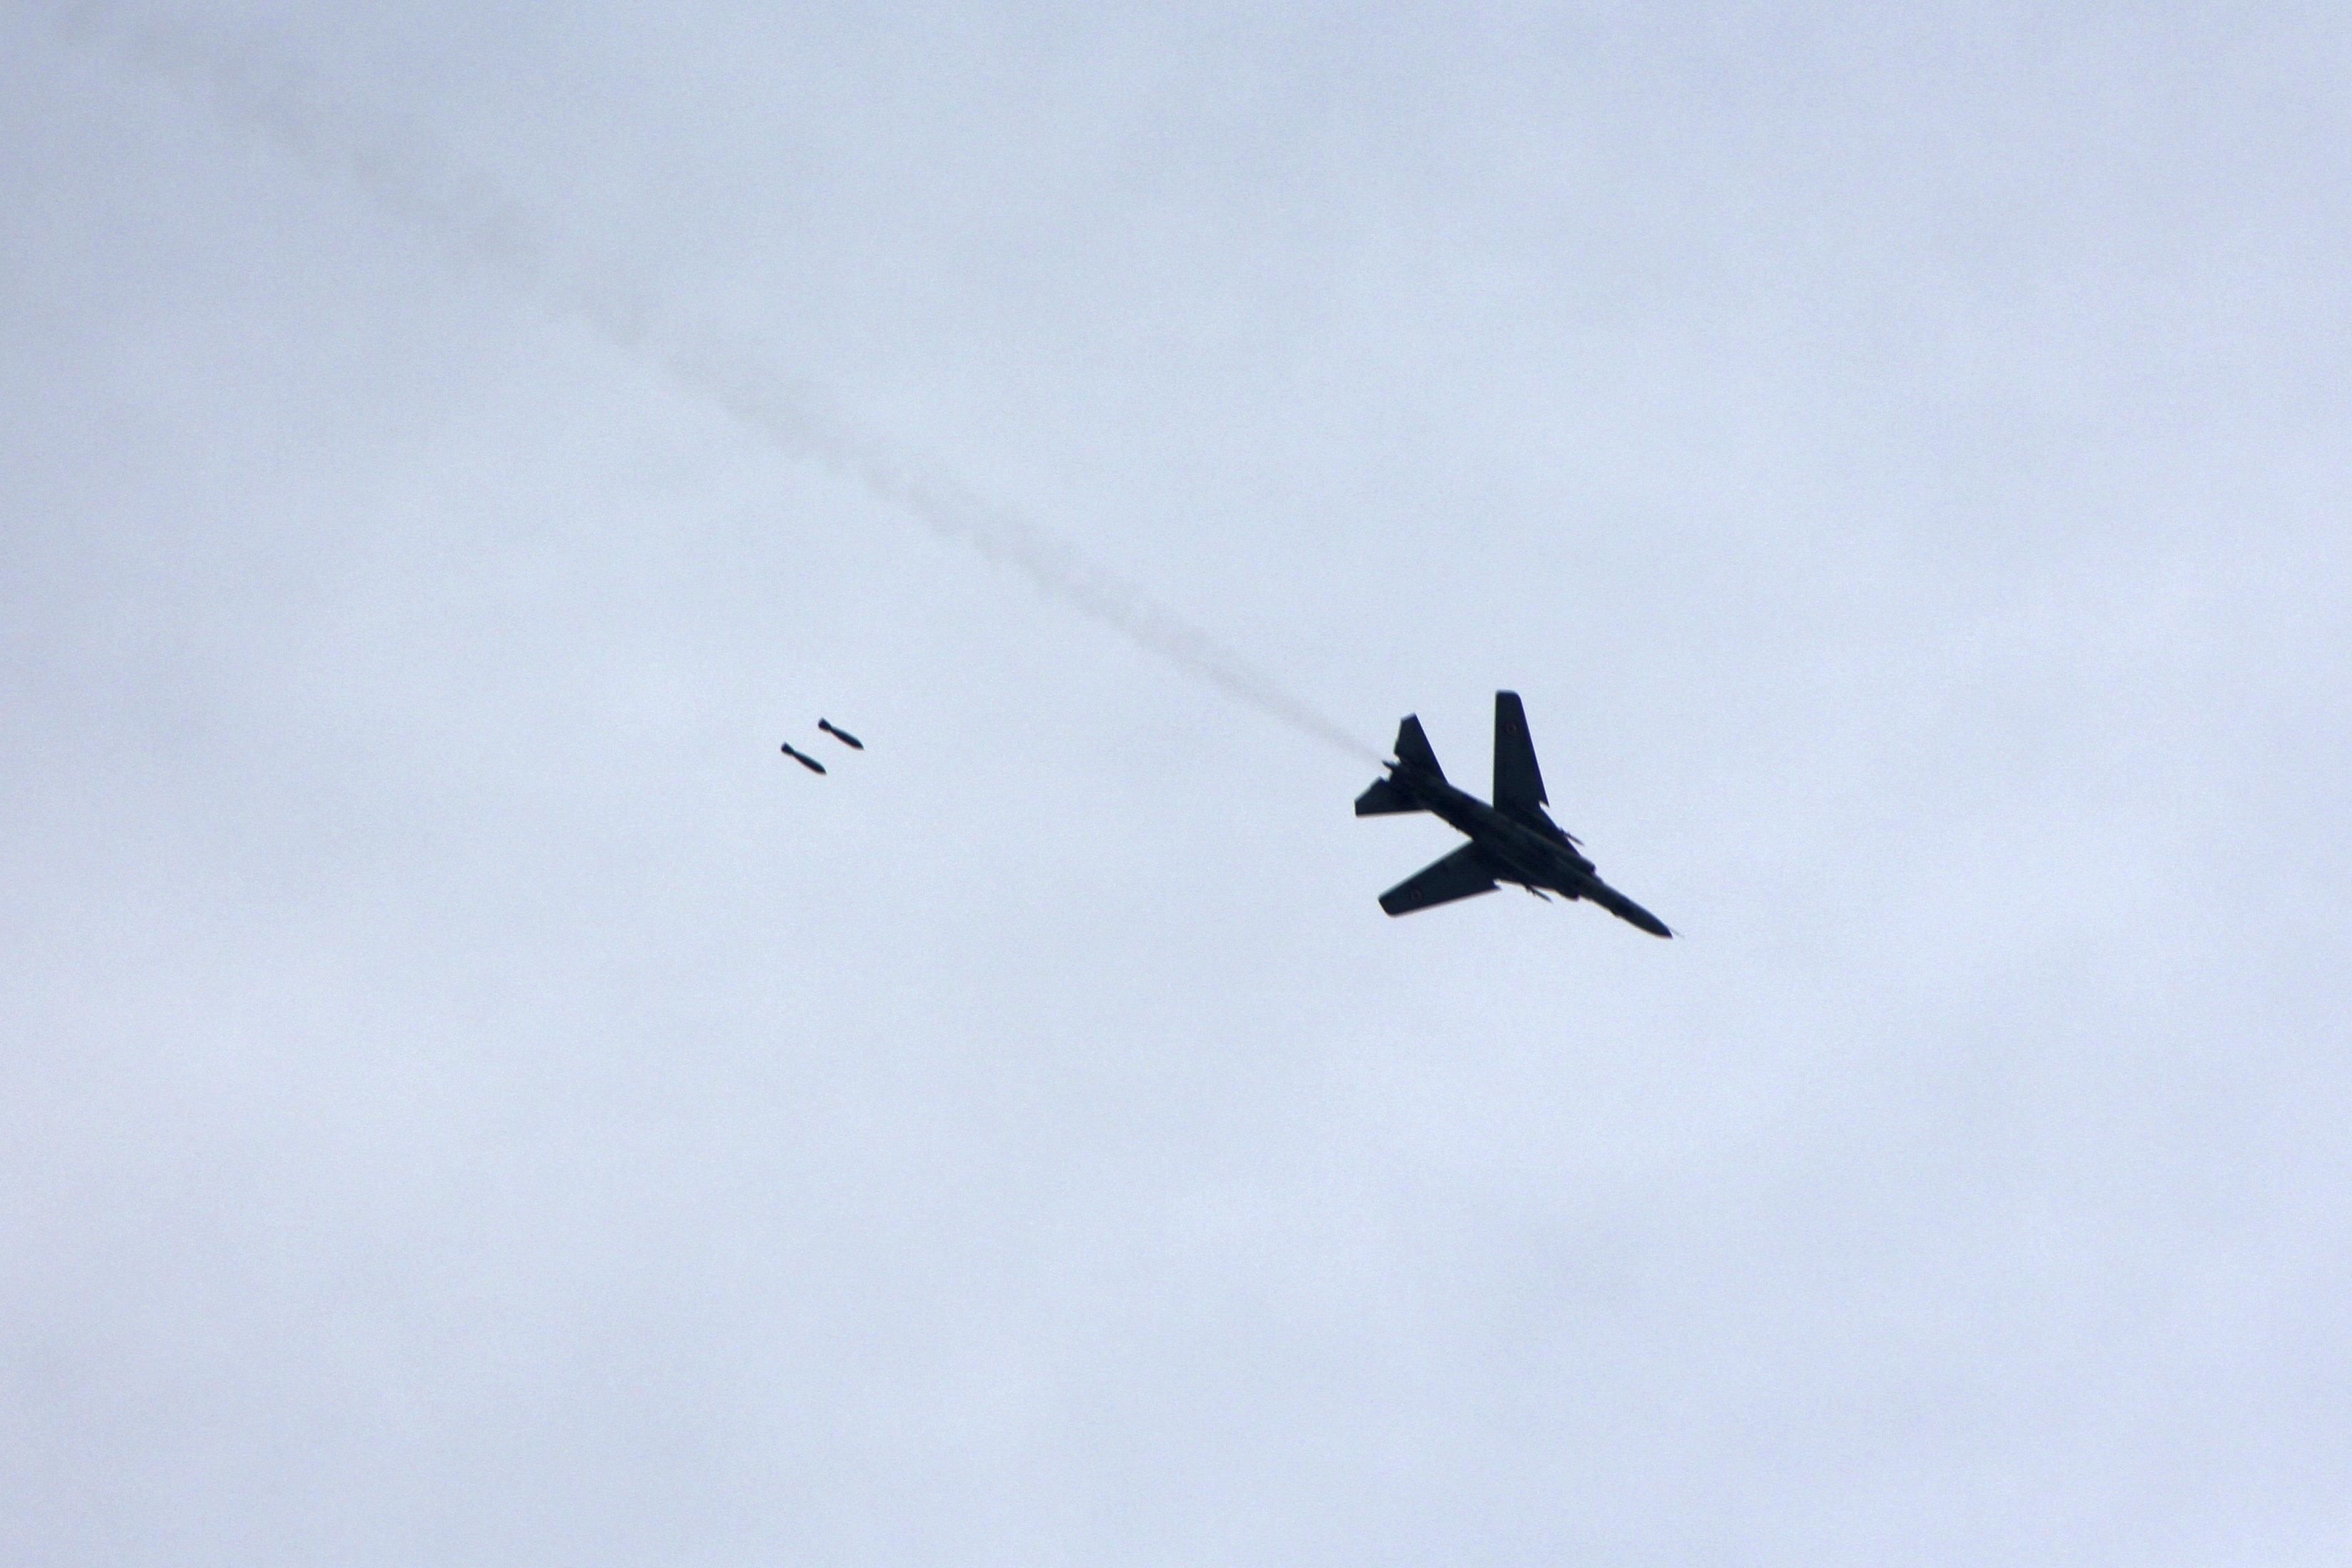 A warplane loyal to Syria's President Bashar al-Assad fires rockets during an air strike in eastern Al-Ghouta.